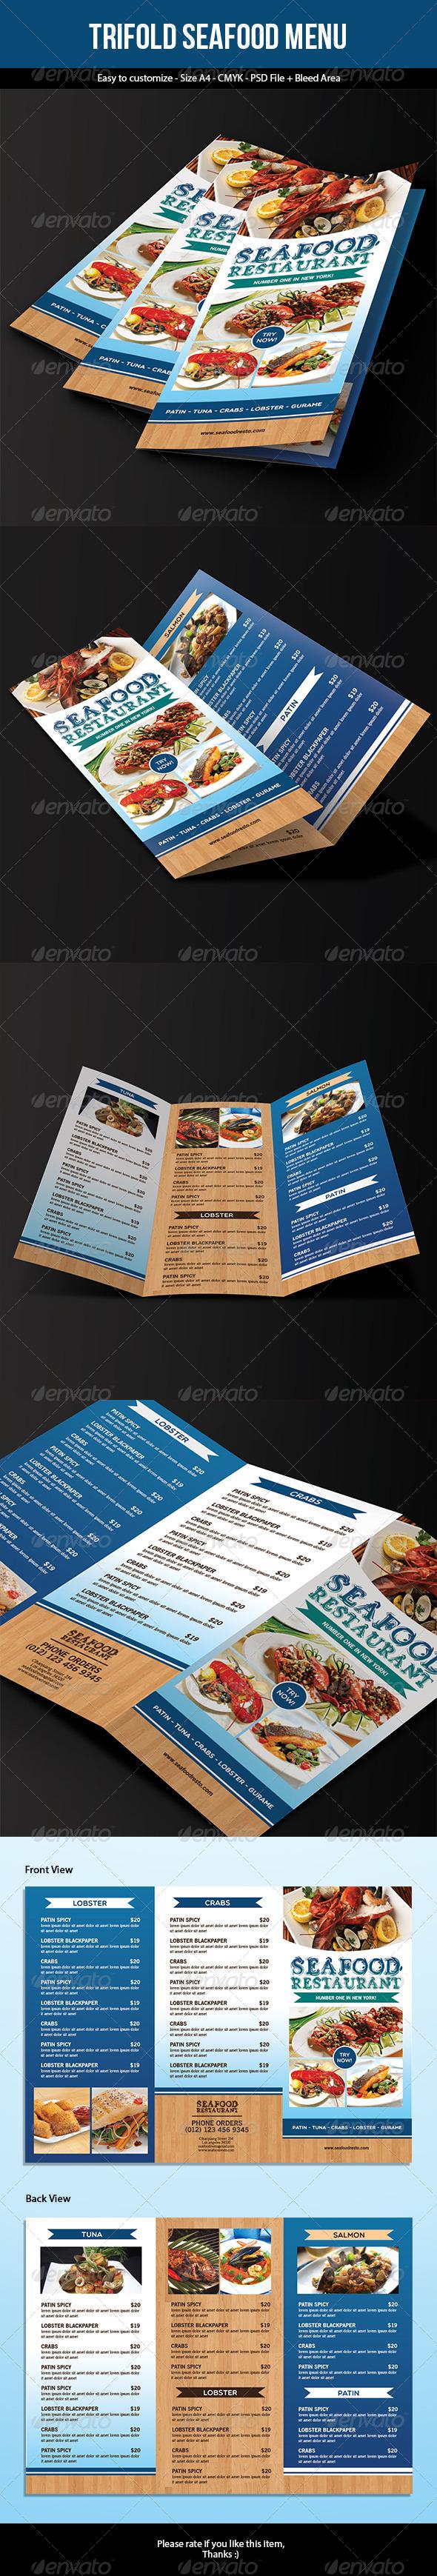 Trifold Seafood Menu - Food Menus Print Templates